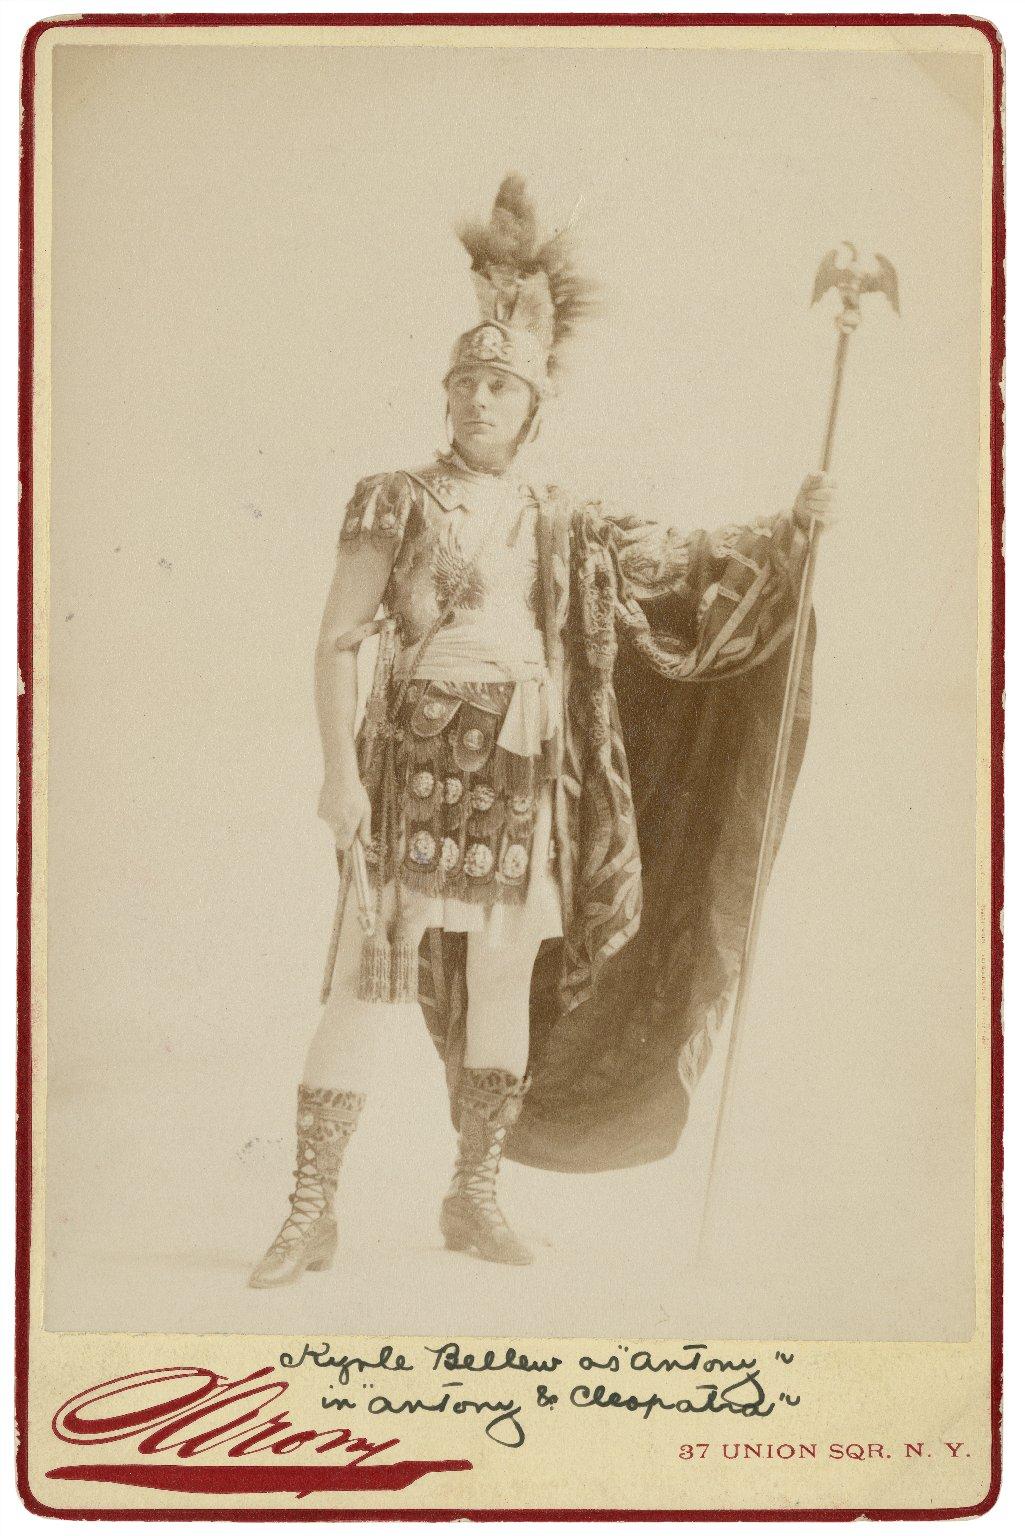 Kyrle Bellew as Antony in Antony and Cleopatra [graphic] / Sarony.